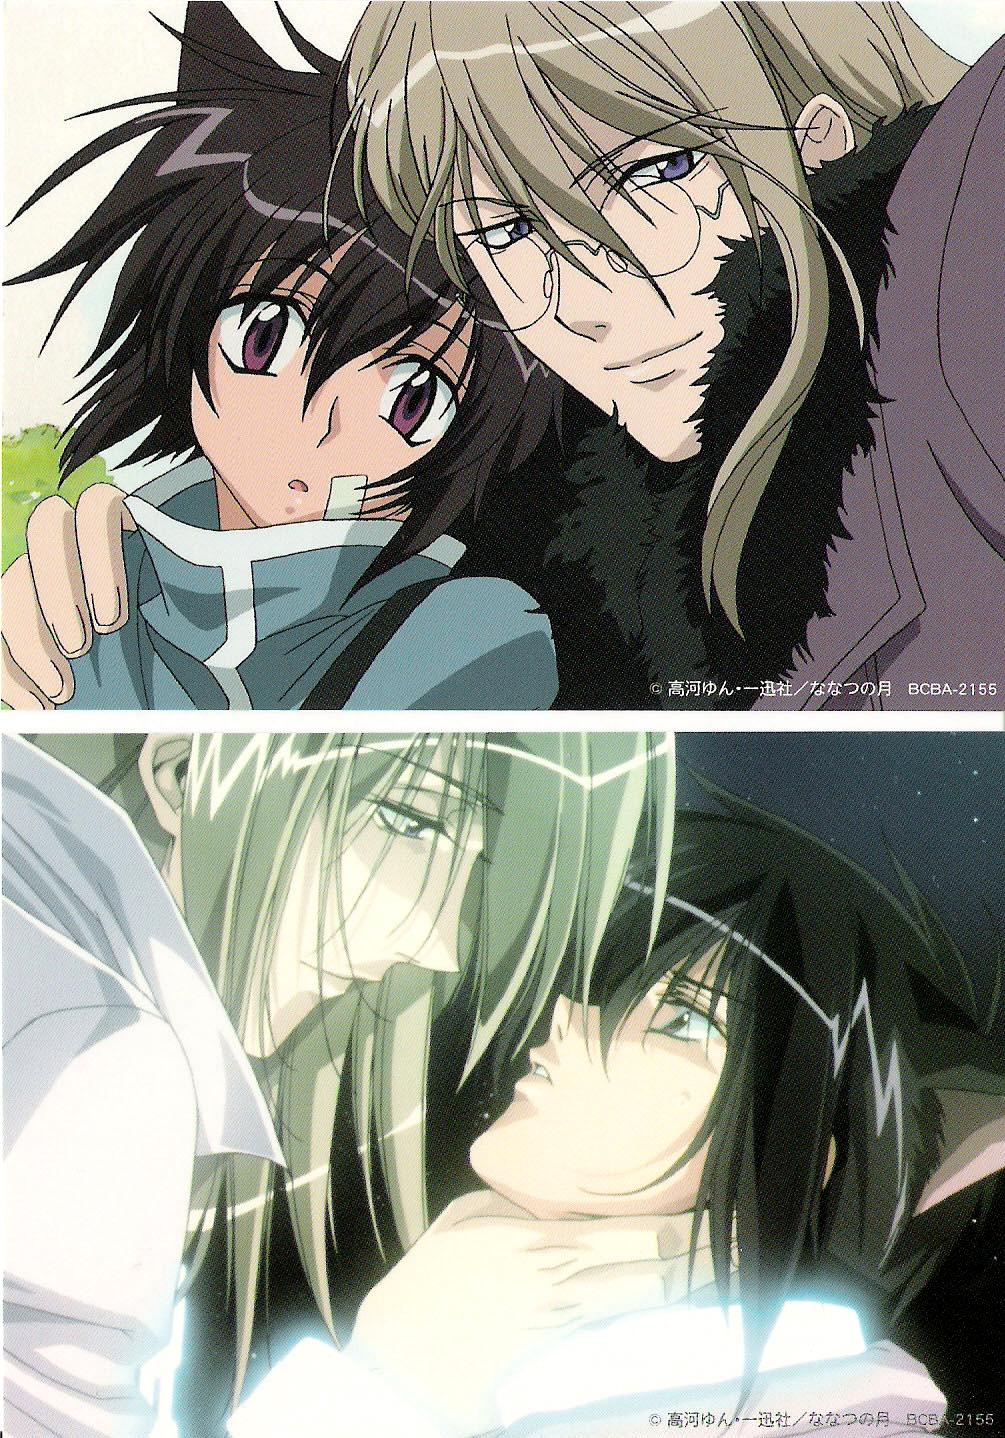 Tags anime j c staff loveless aoyagi ritsuka agatsuma soubi scan